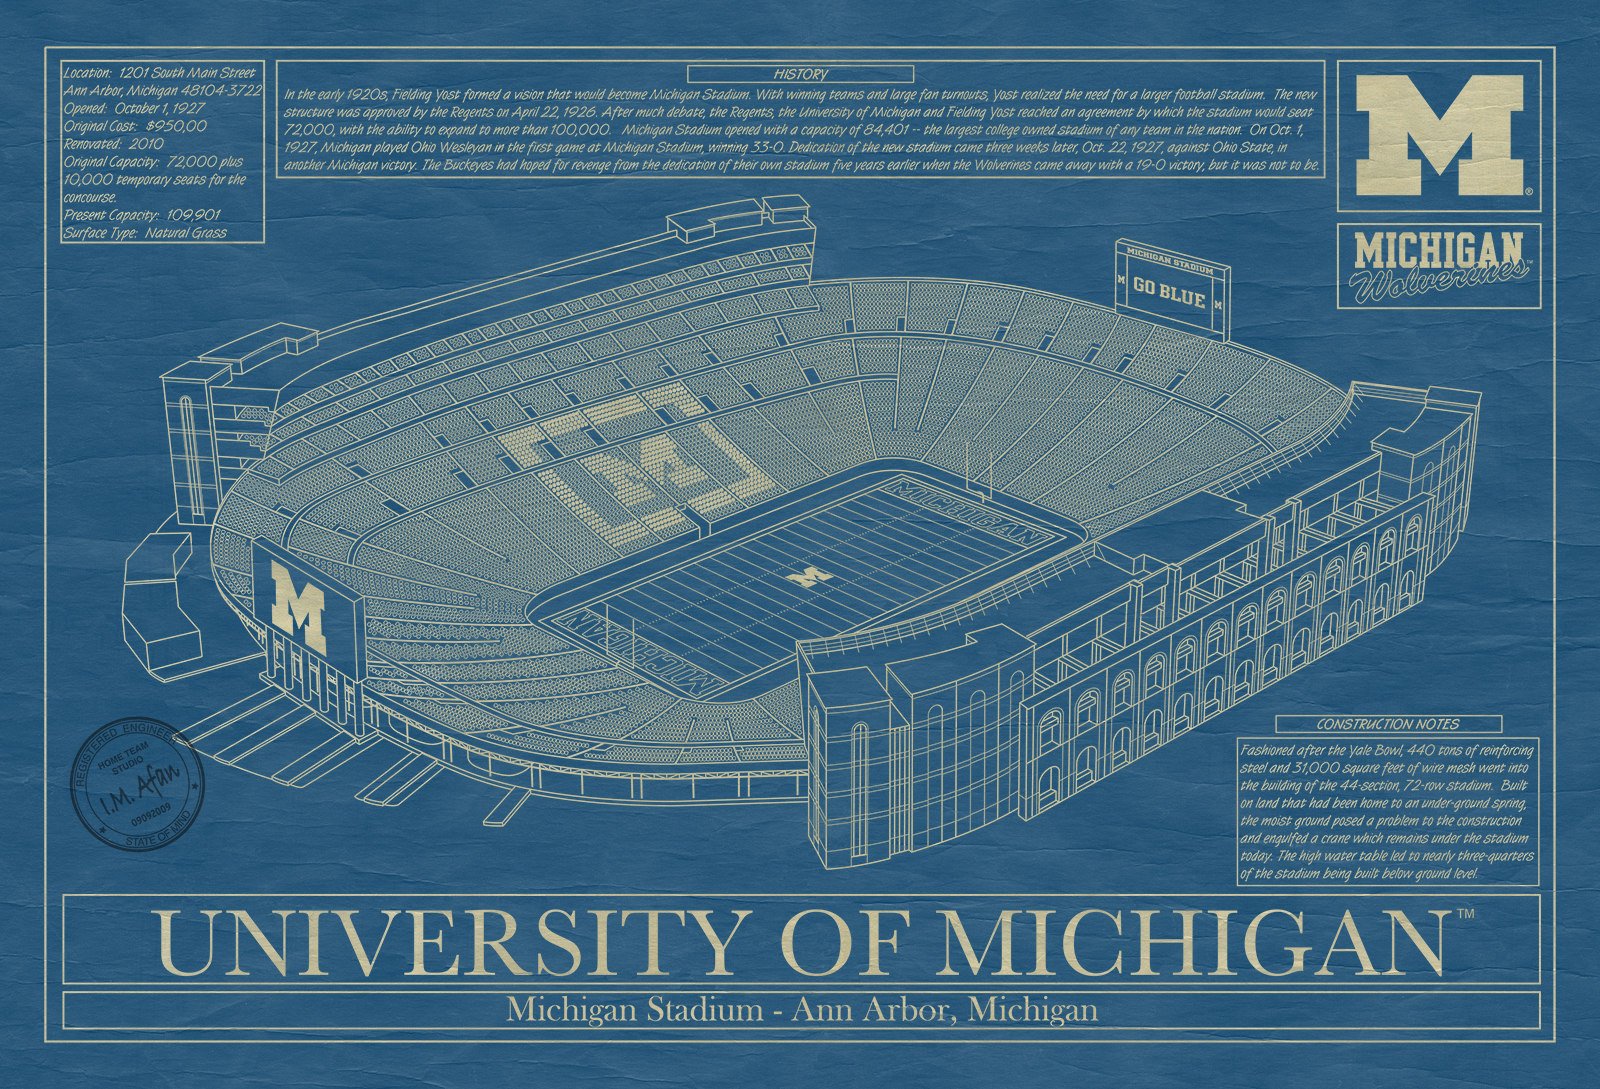 Michigan michigan stadium blueprint art stadium blueprint company click malvernweather Gallery